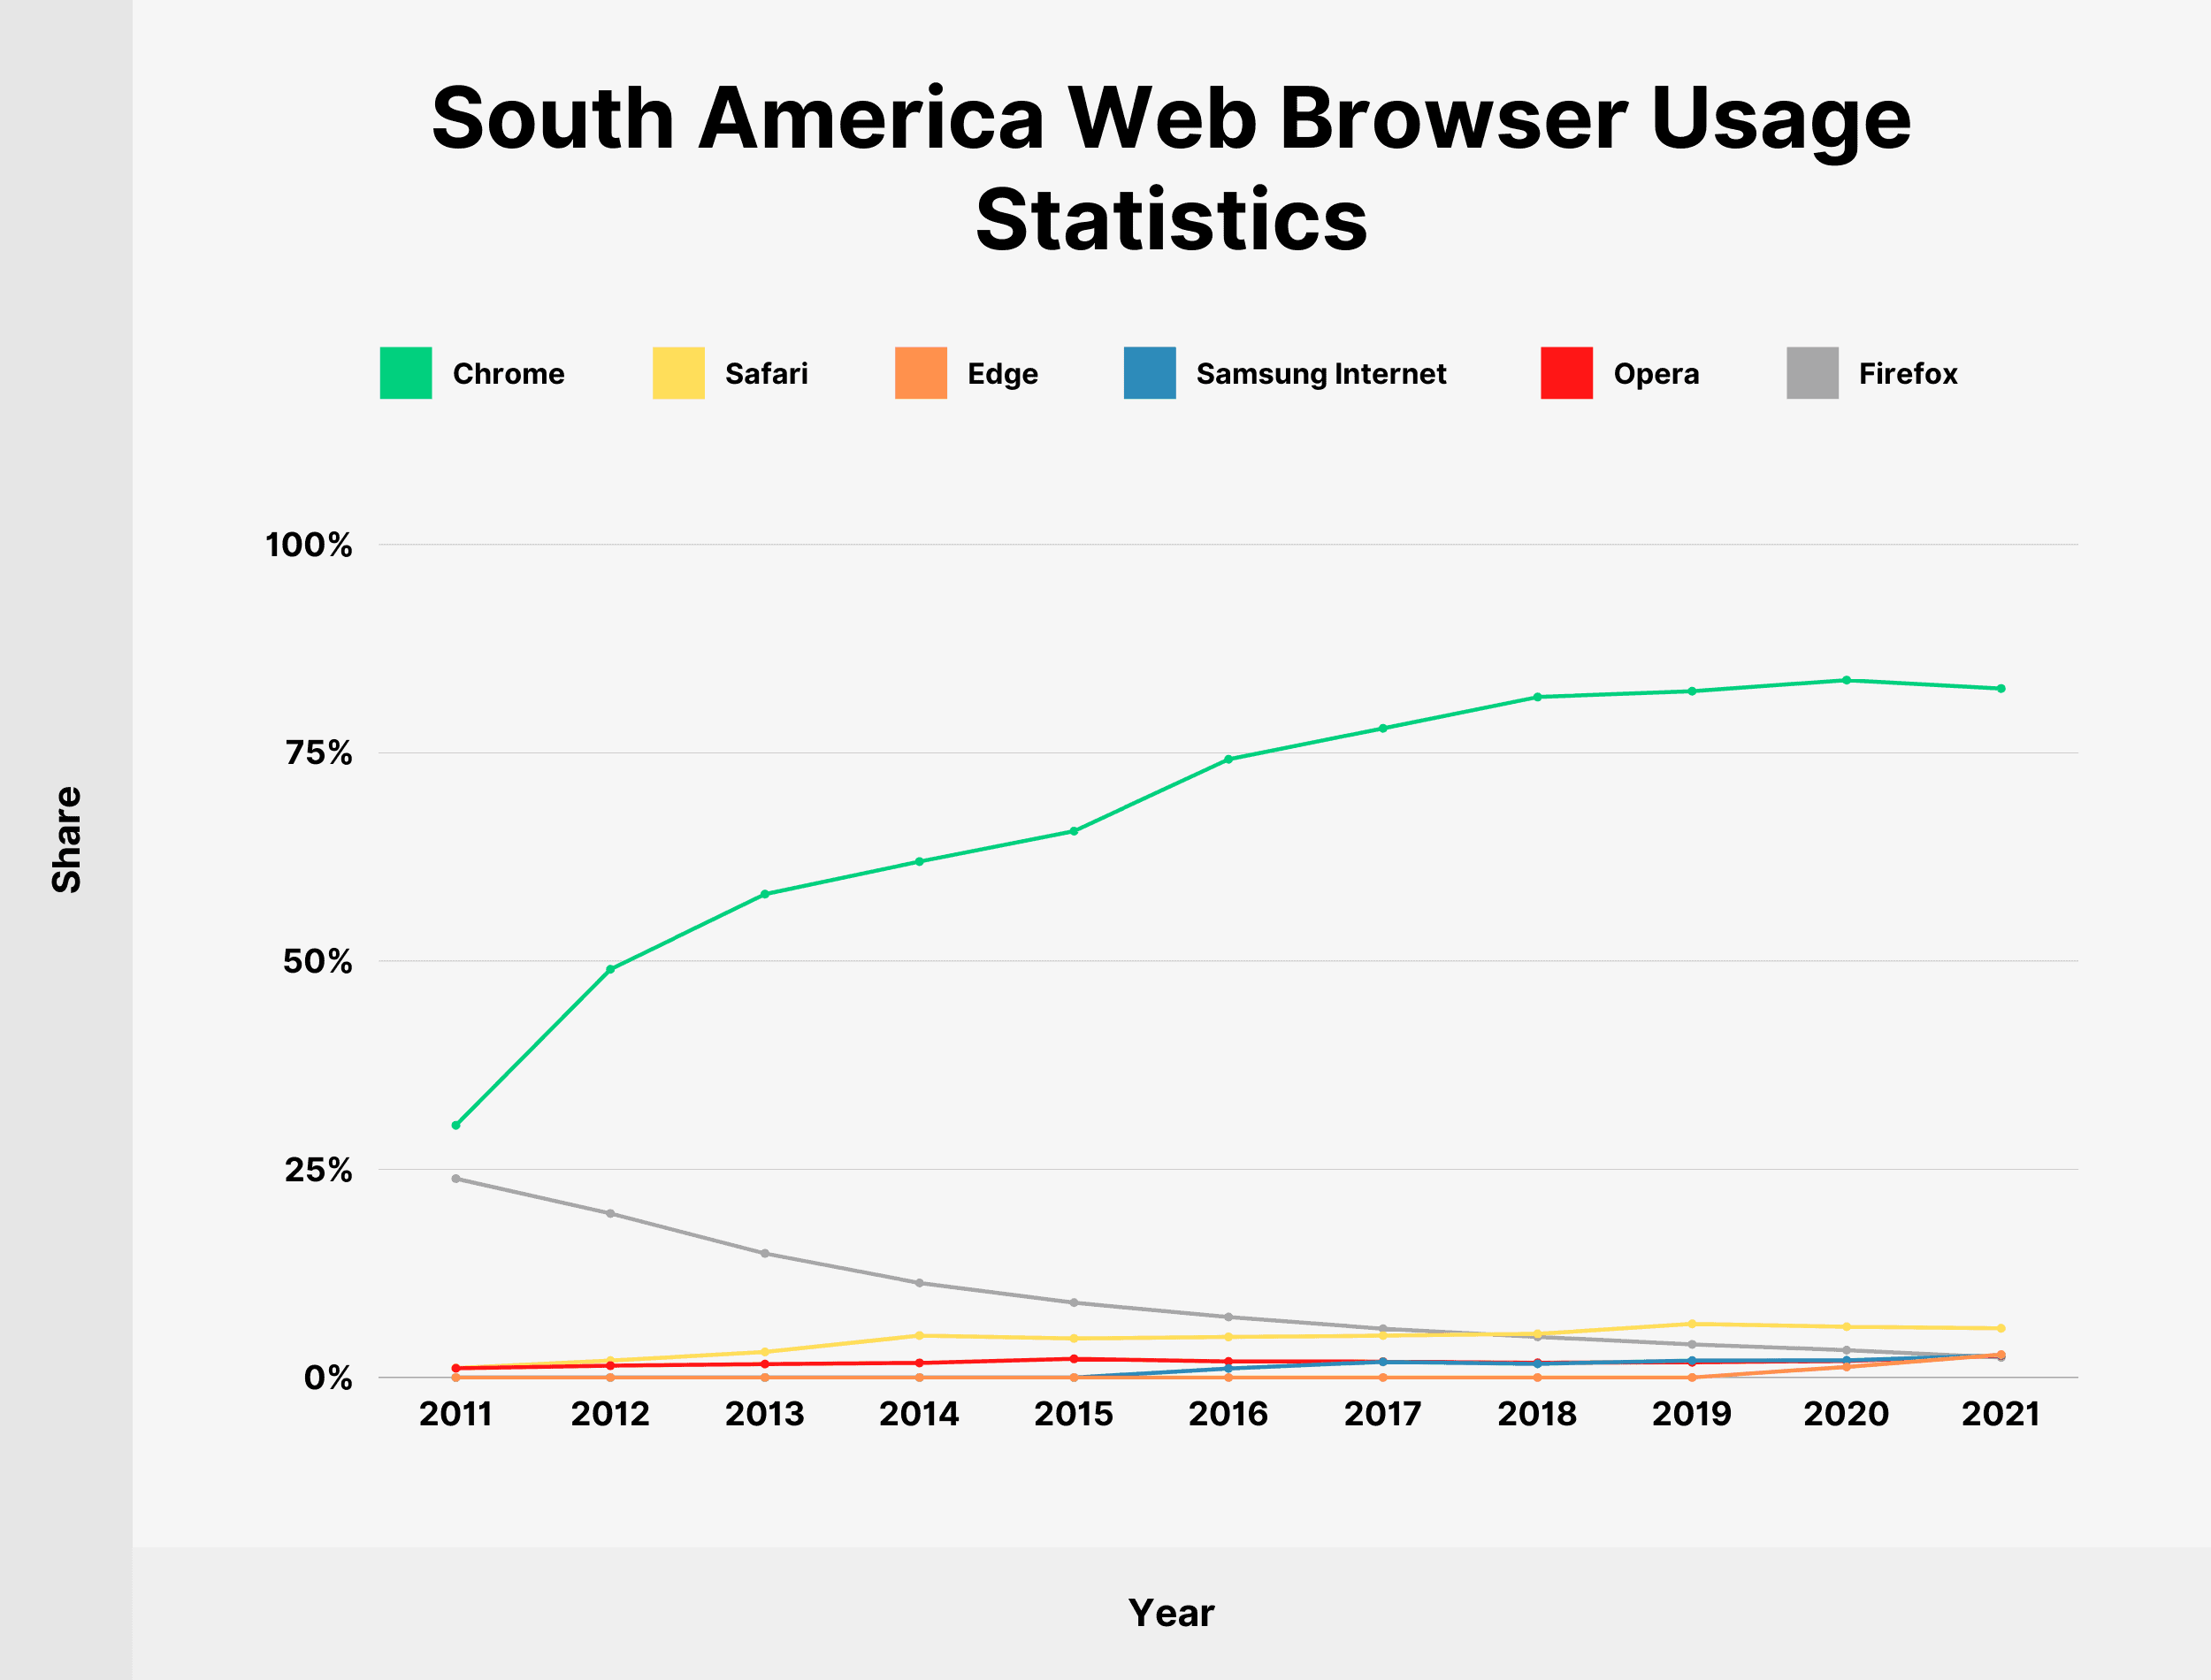 South America Web Browser Usage Statistics